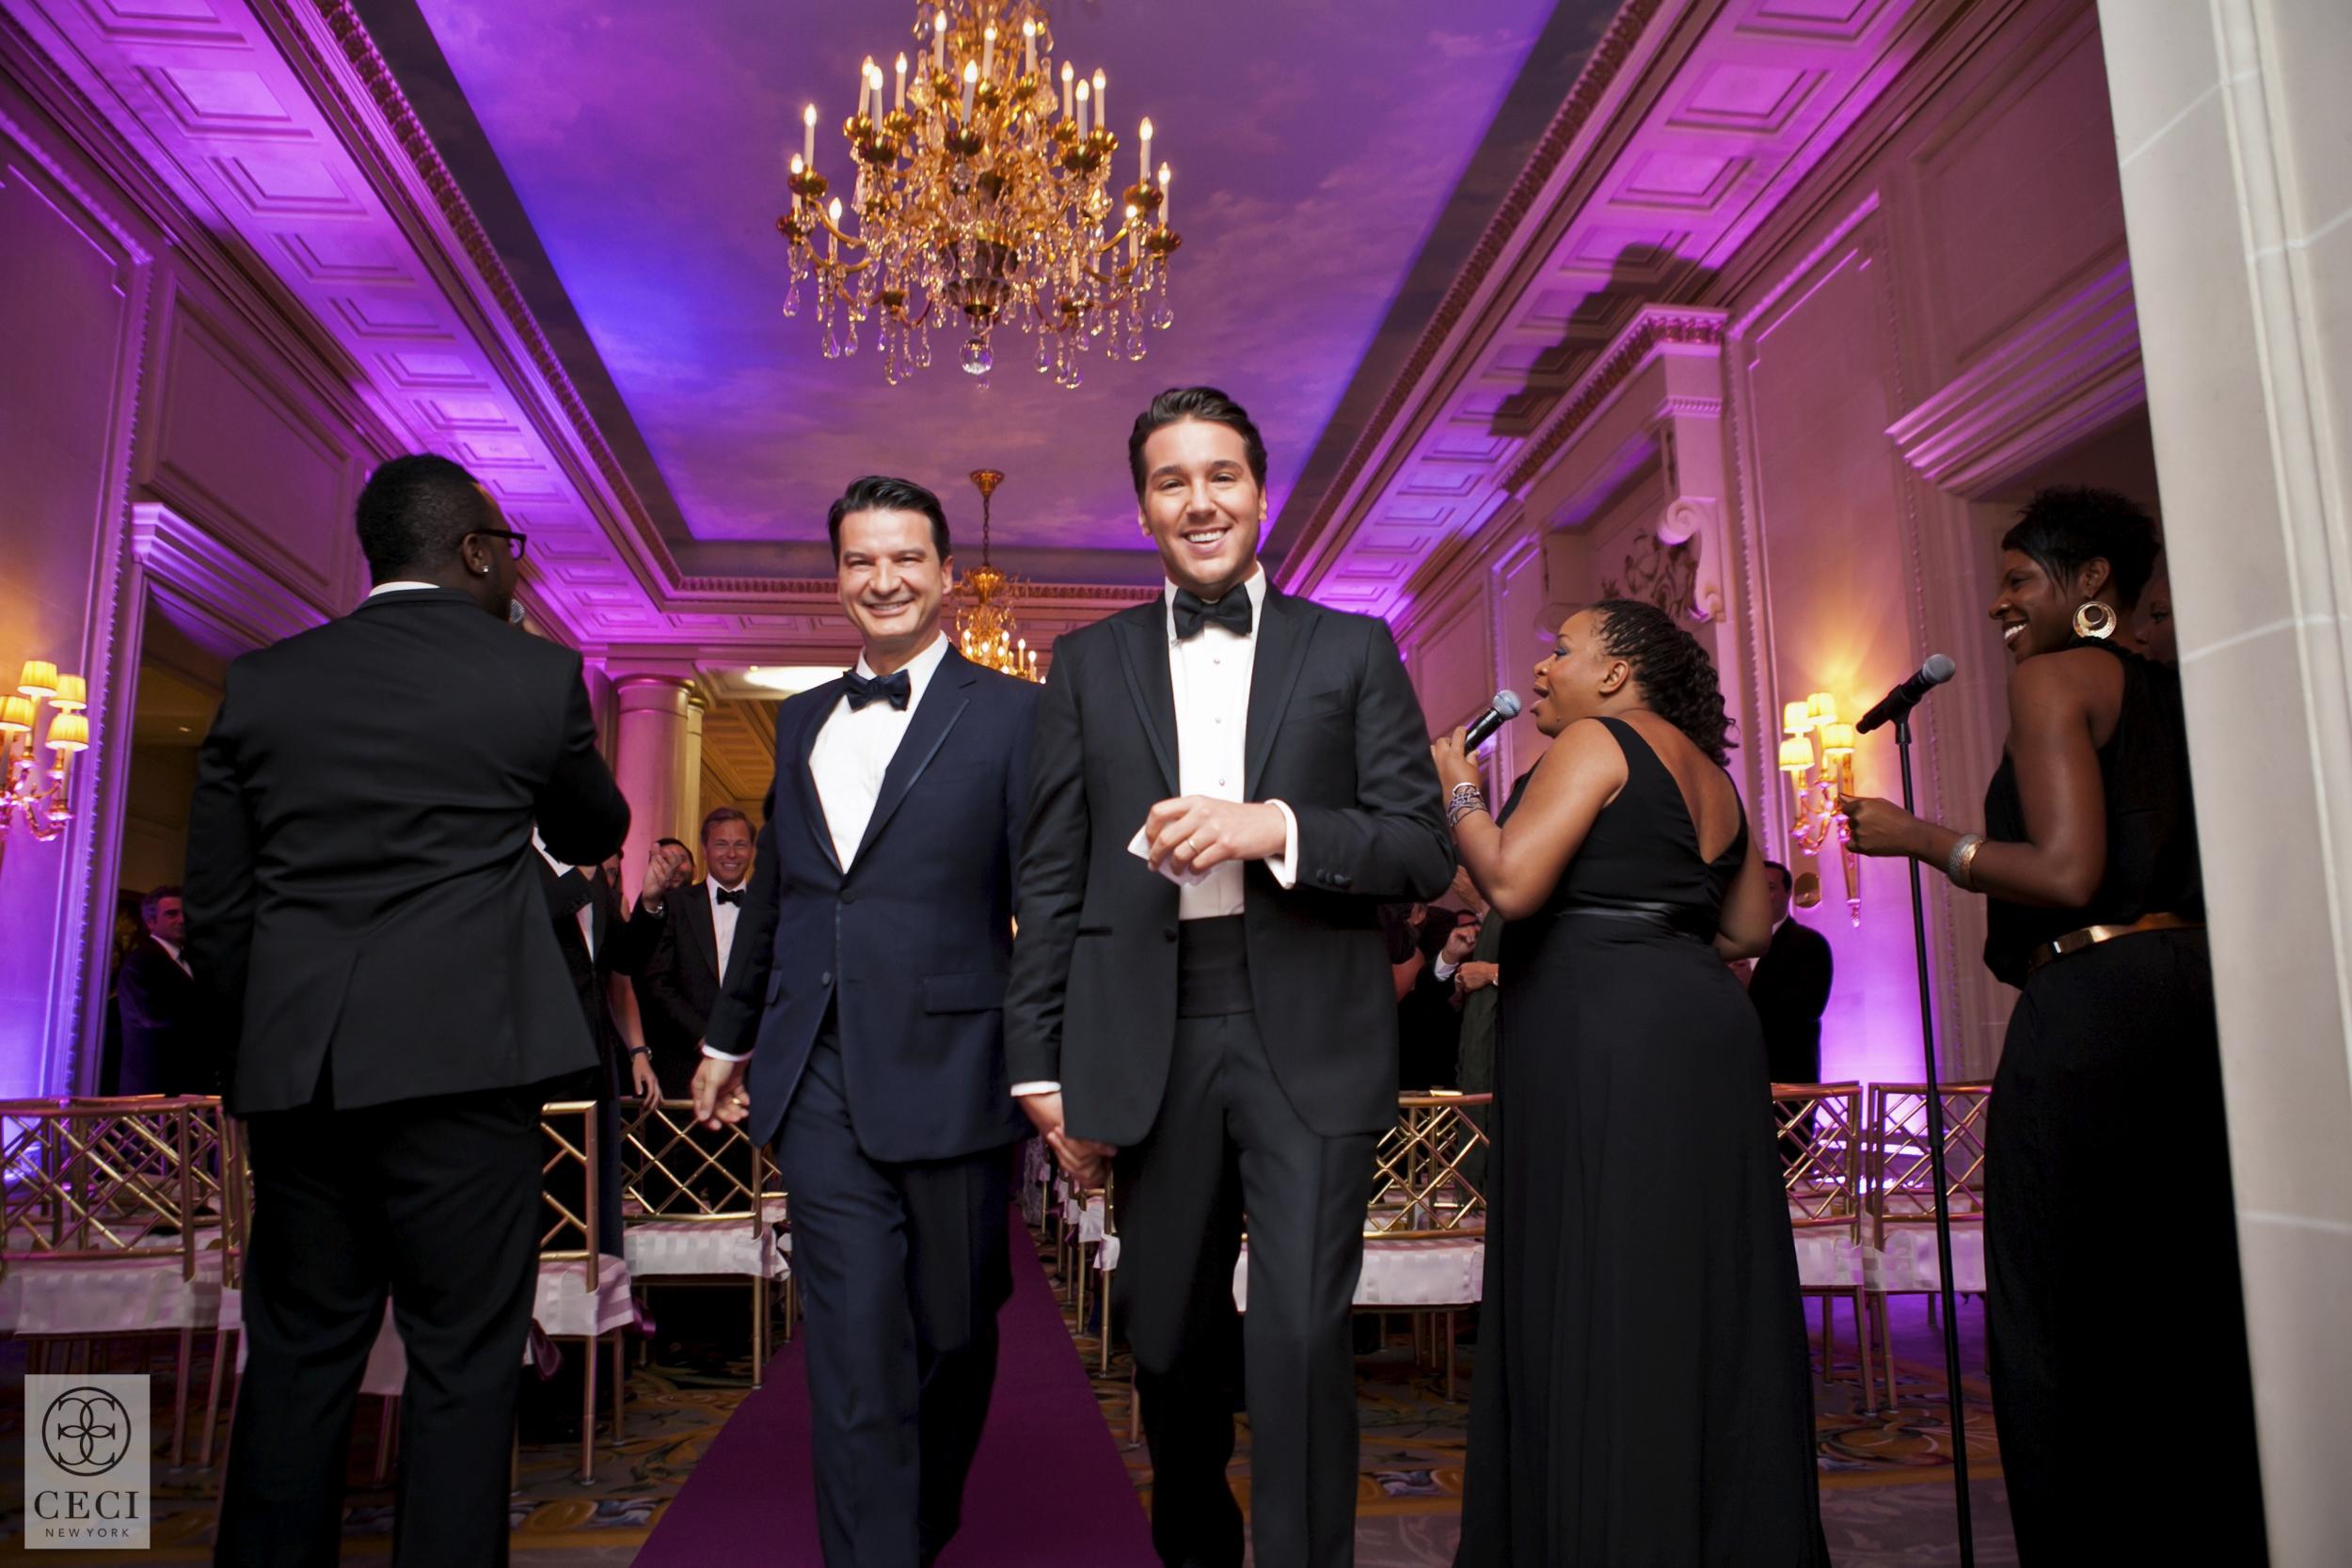 ceci_new_york_lucas_somoza_purple_regal_wediding_birthday_commitment_ceremony_gold-9.jpg